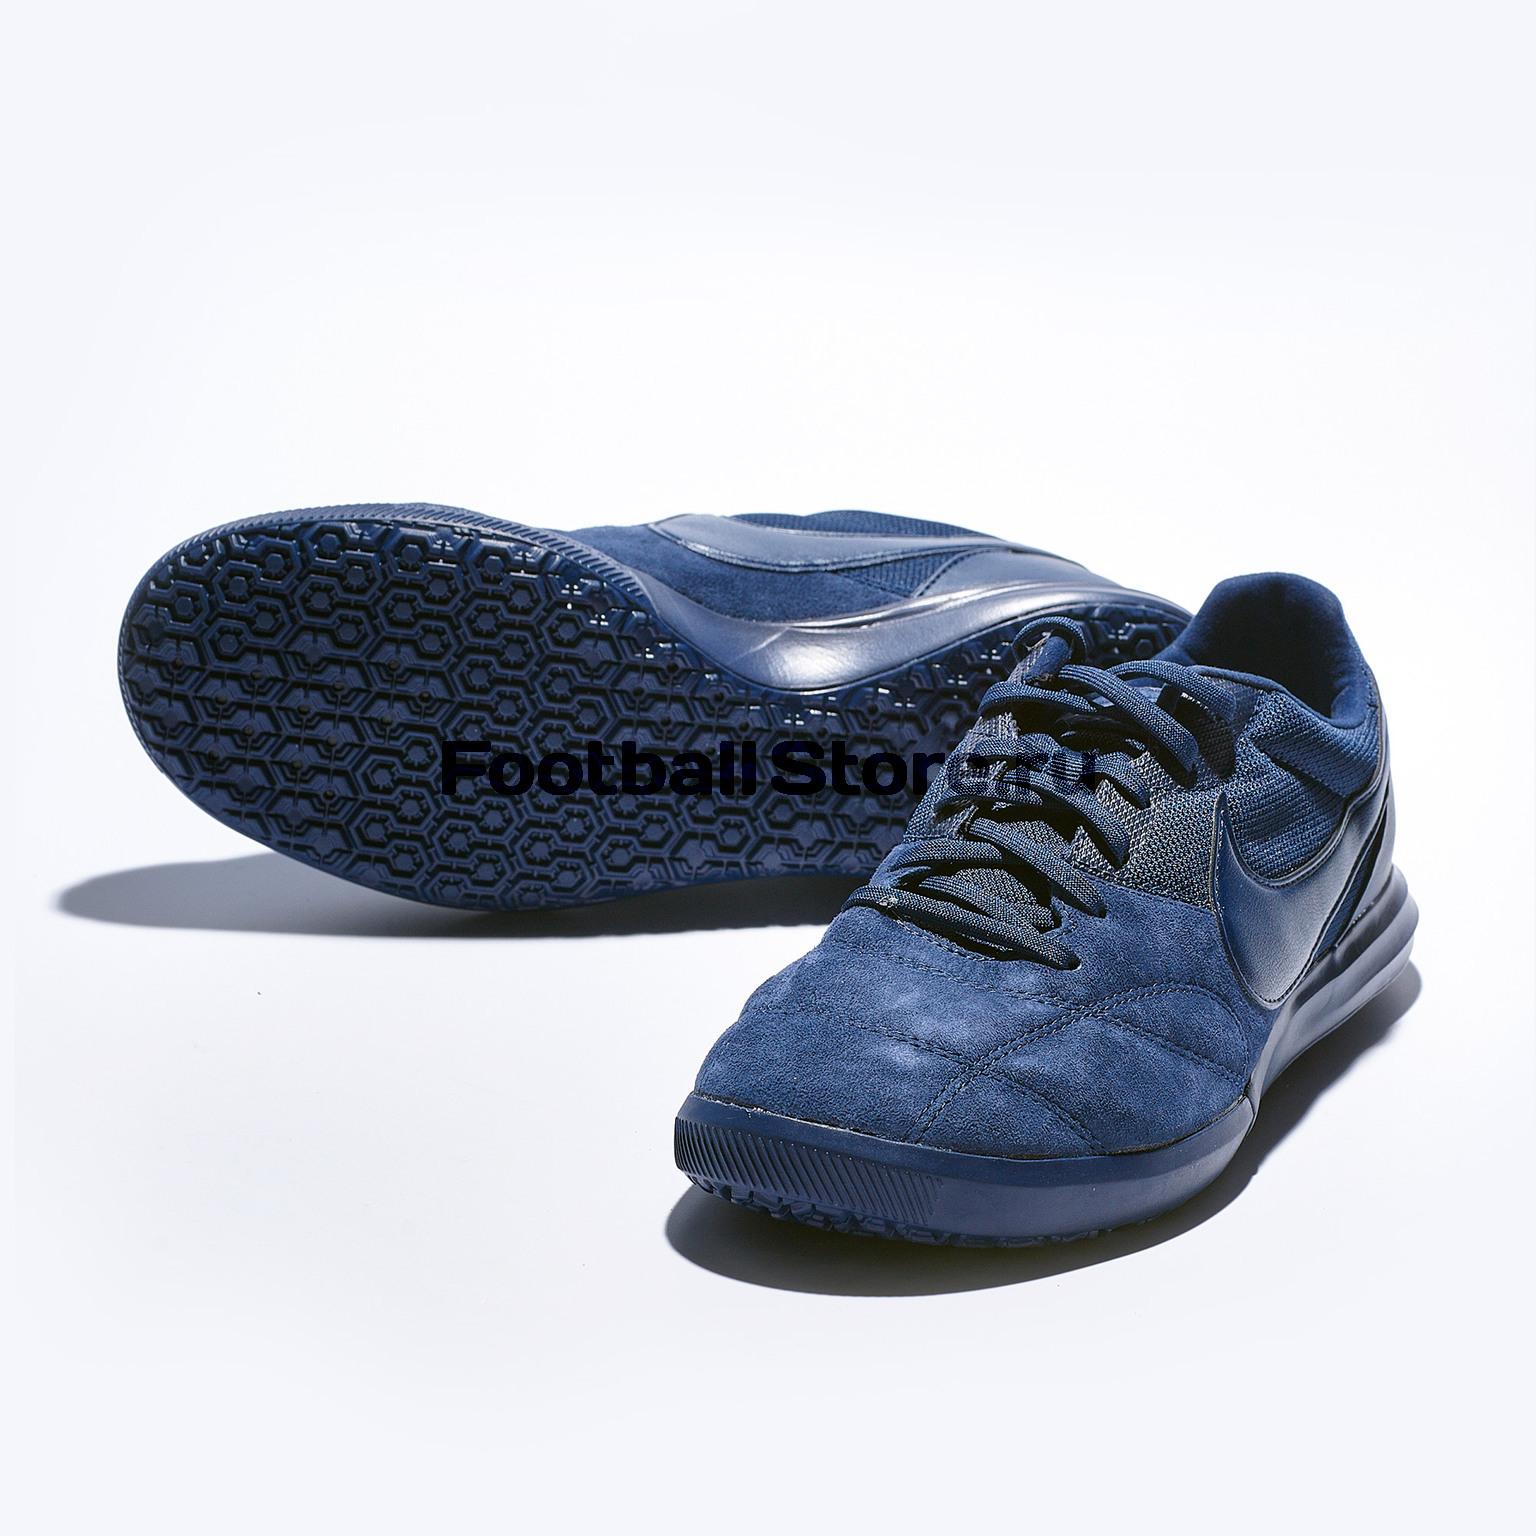 Футзалки Nike Tiempo Premier II Sala AV3153-441 – купить футзалки в интернет  магазине footballstore, цена, фото 7811455a5cf